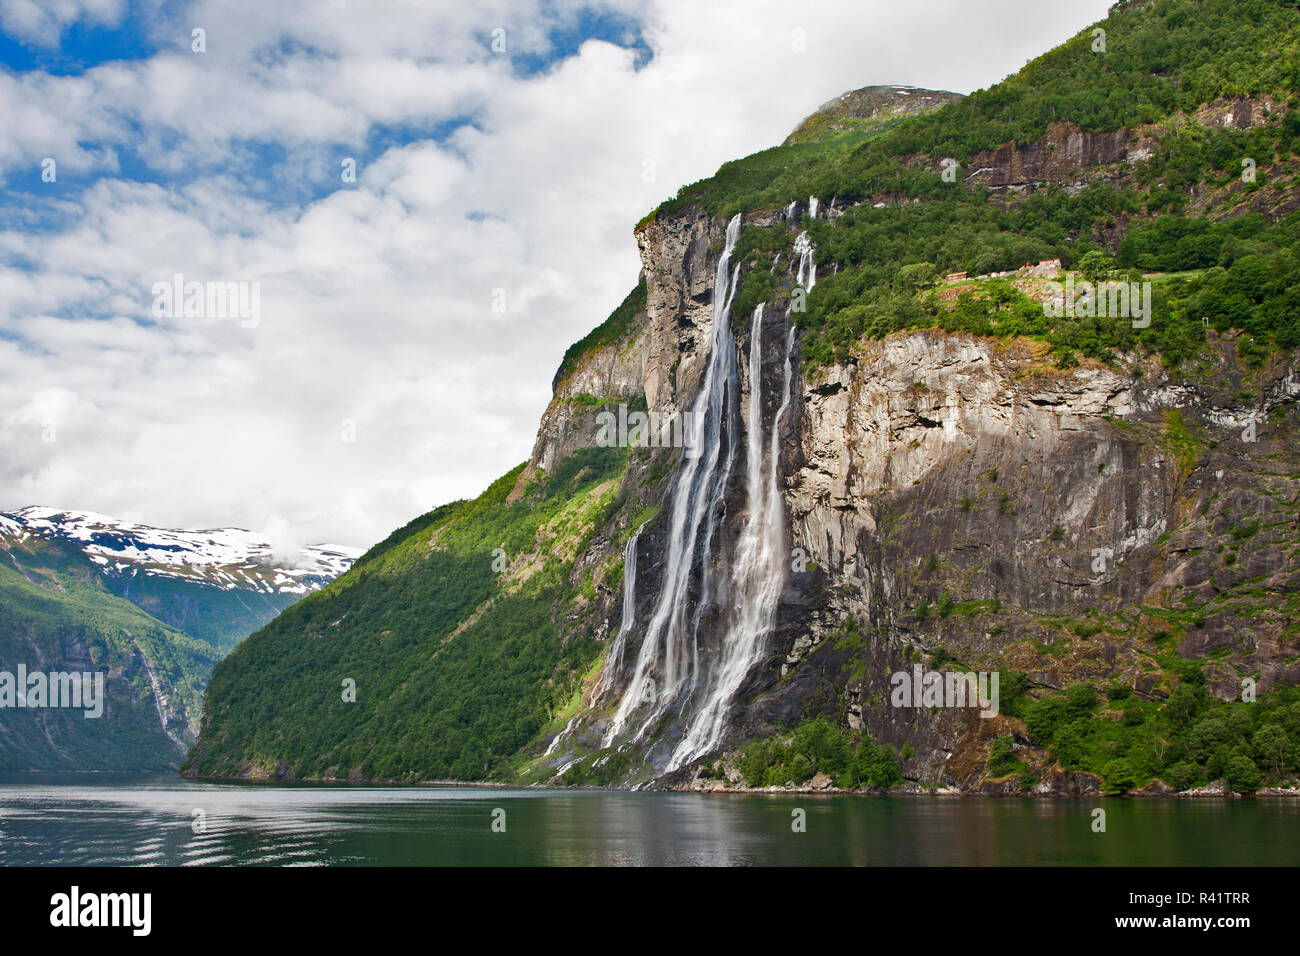 Gerainger Fjord, Norway, Seven Sisters Falls, waterfalls, Stock Photo